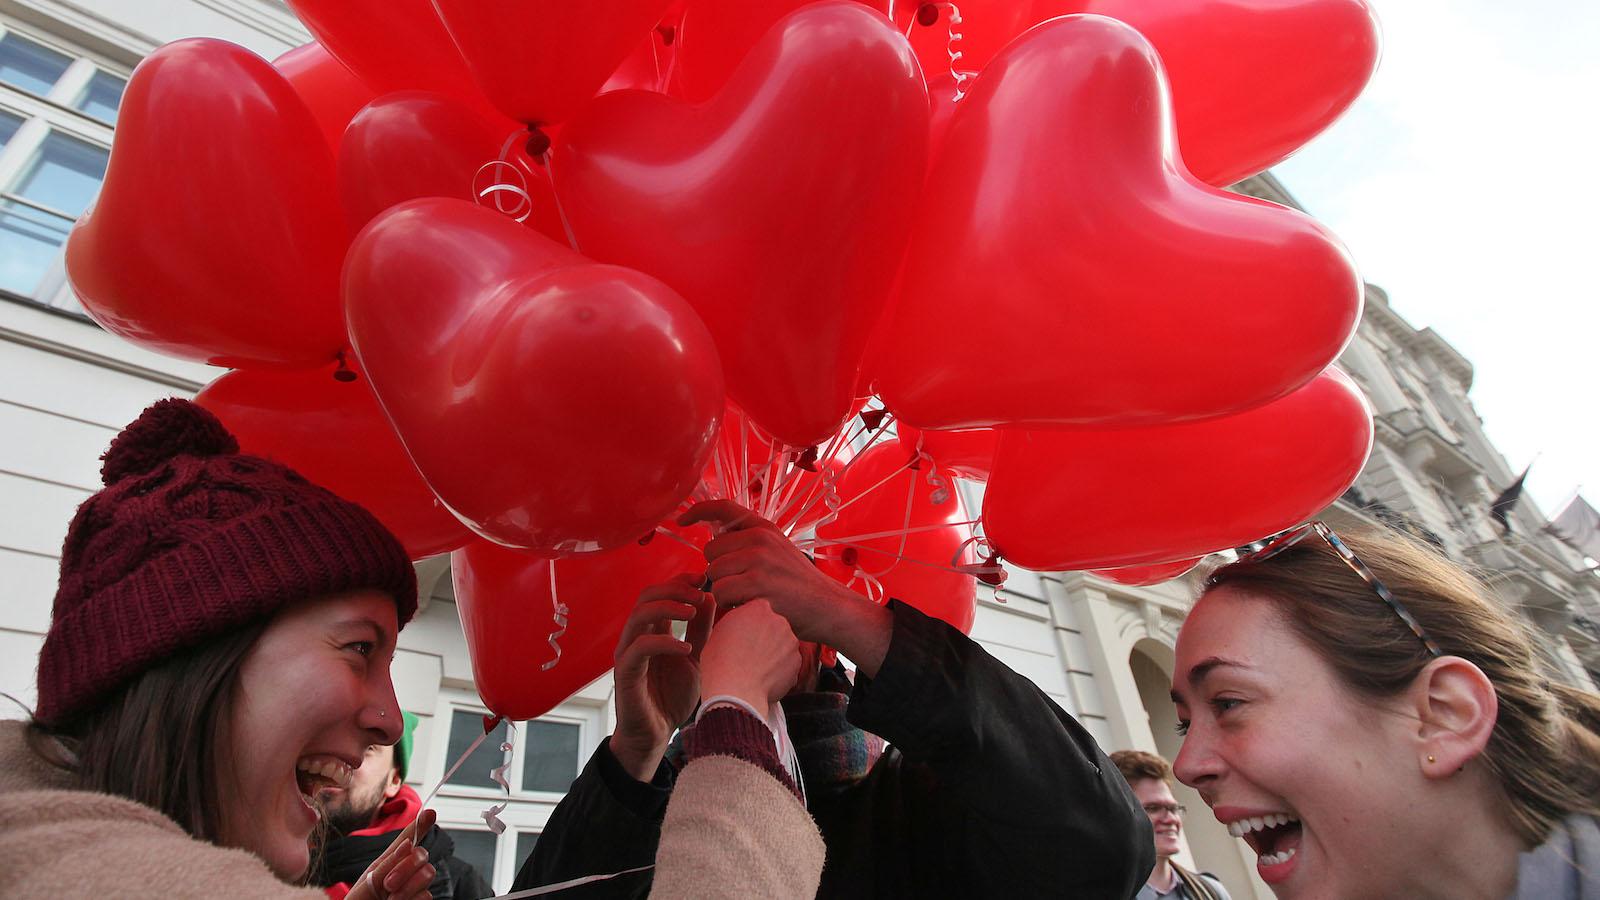 girls hold heart-shaped balloons